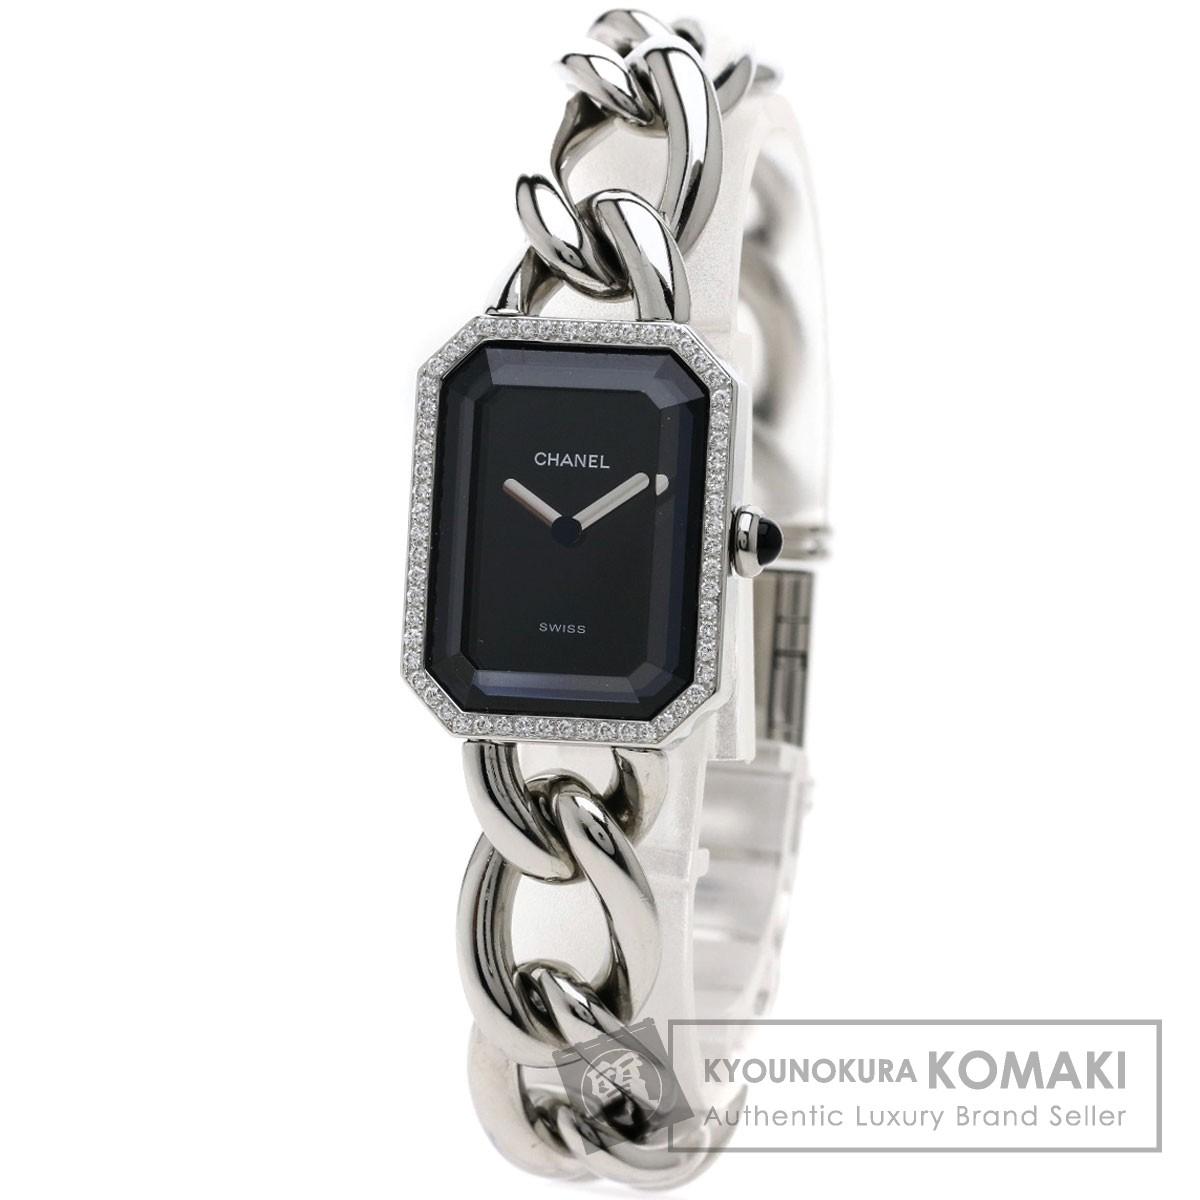 CHANEL  H3252 プルミエールL ダイヤモンド 腕時計 ステンレス/SS レディース 【中古】【シャネル】